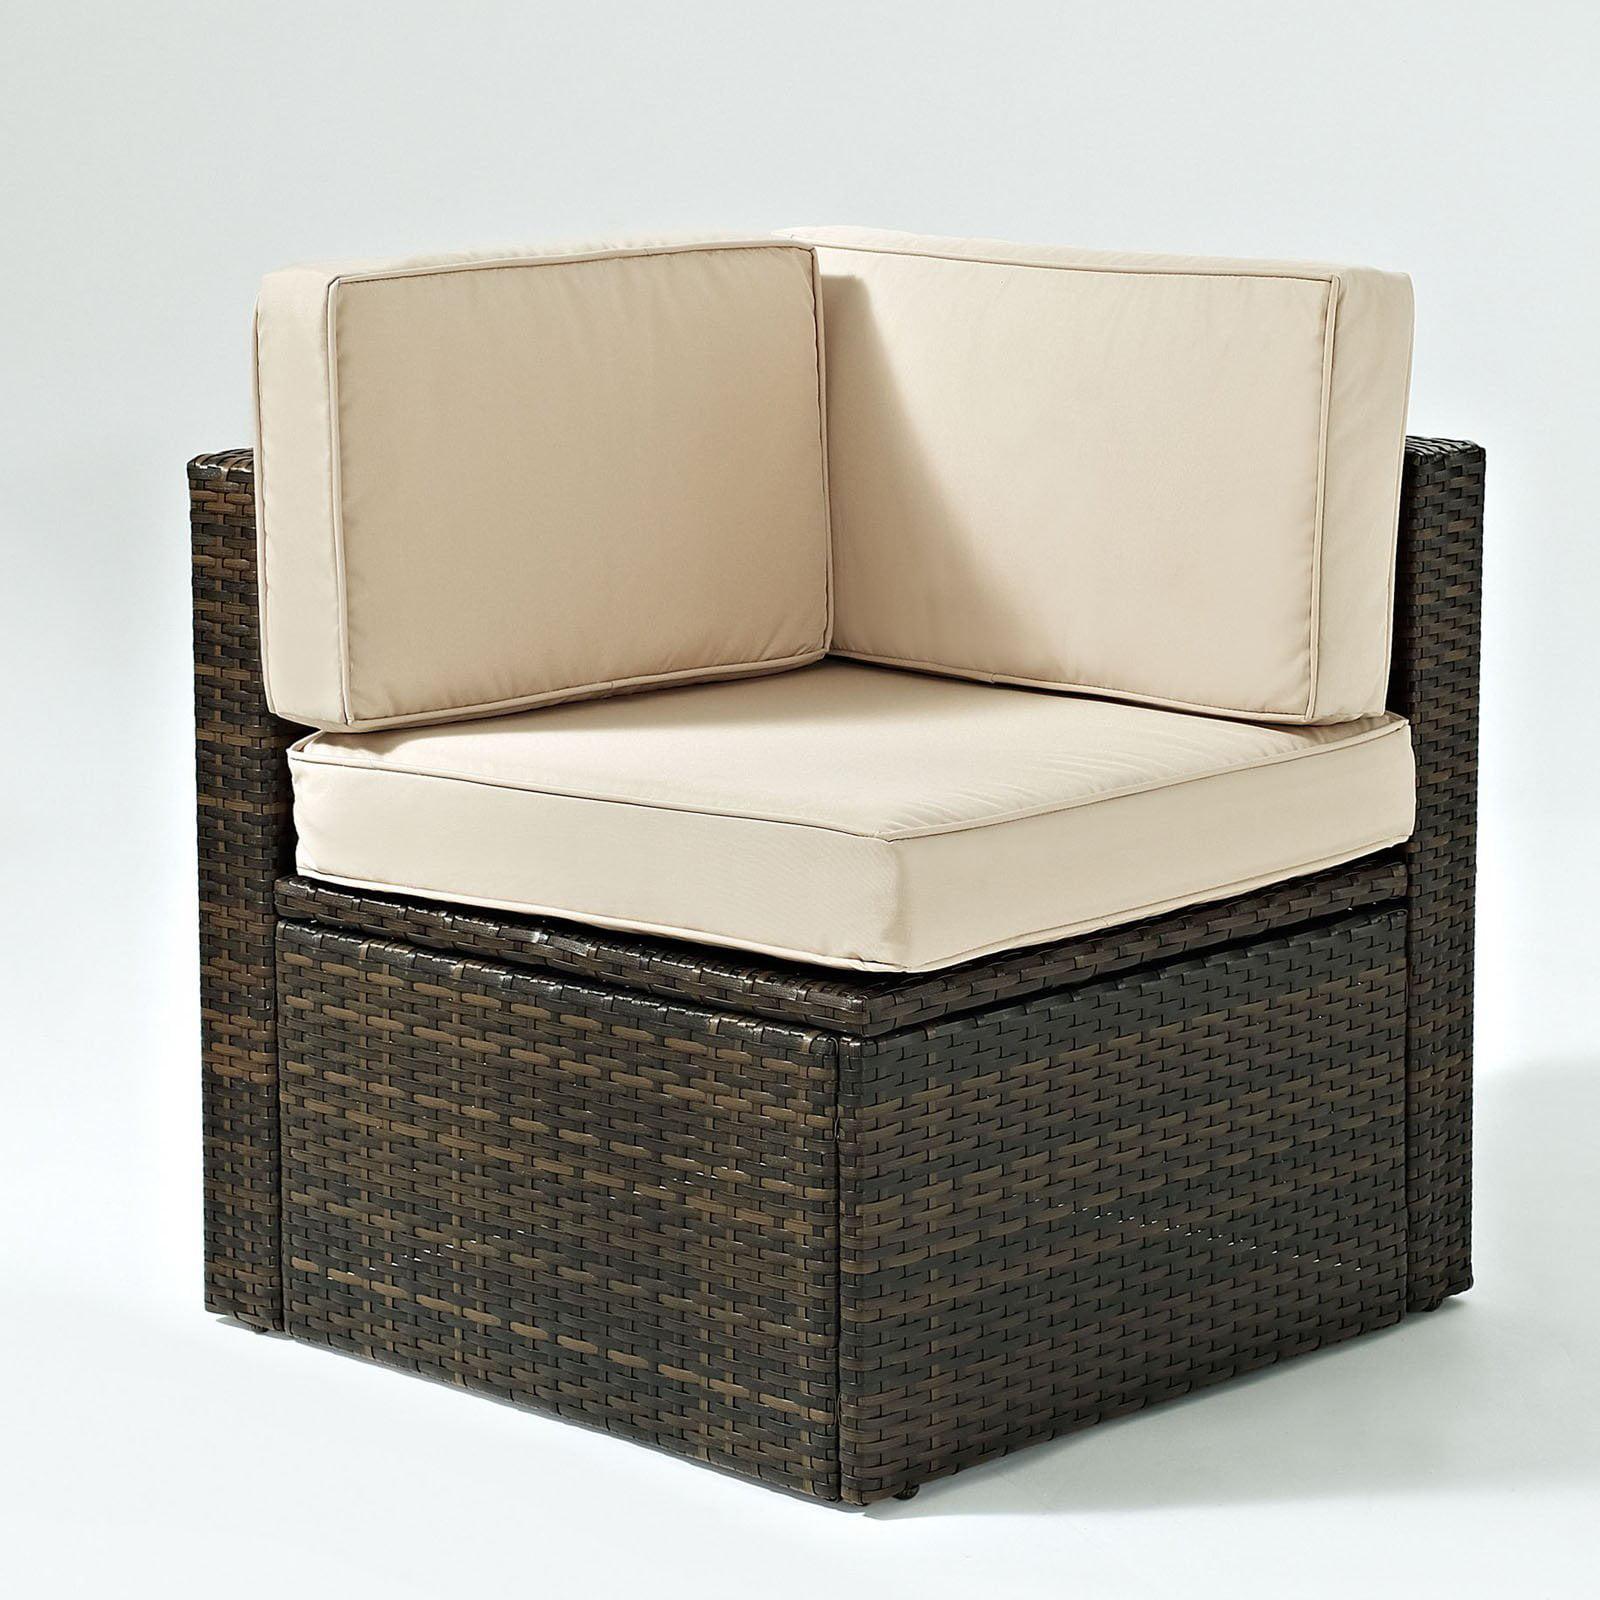 Crosley Furniture Palm Harbor Outdoor Wicker Corner Chair by Generic